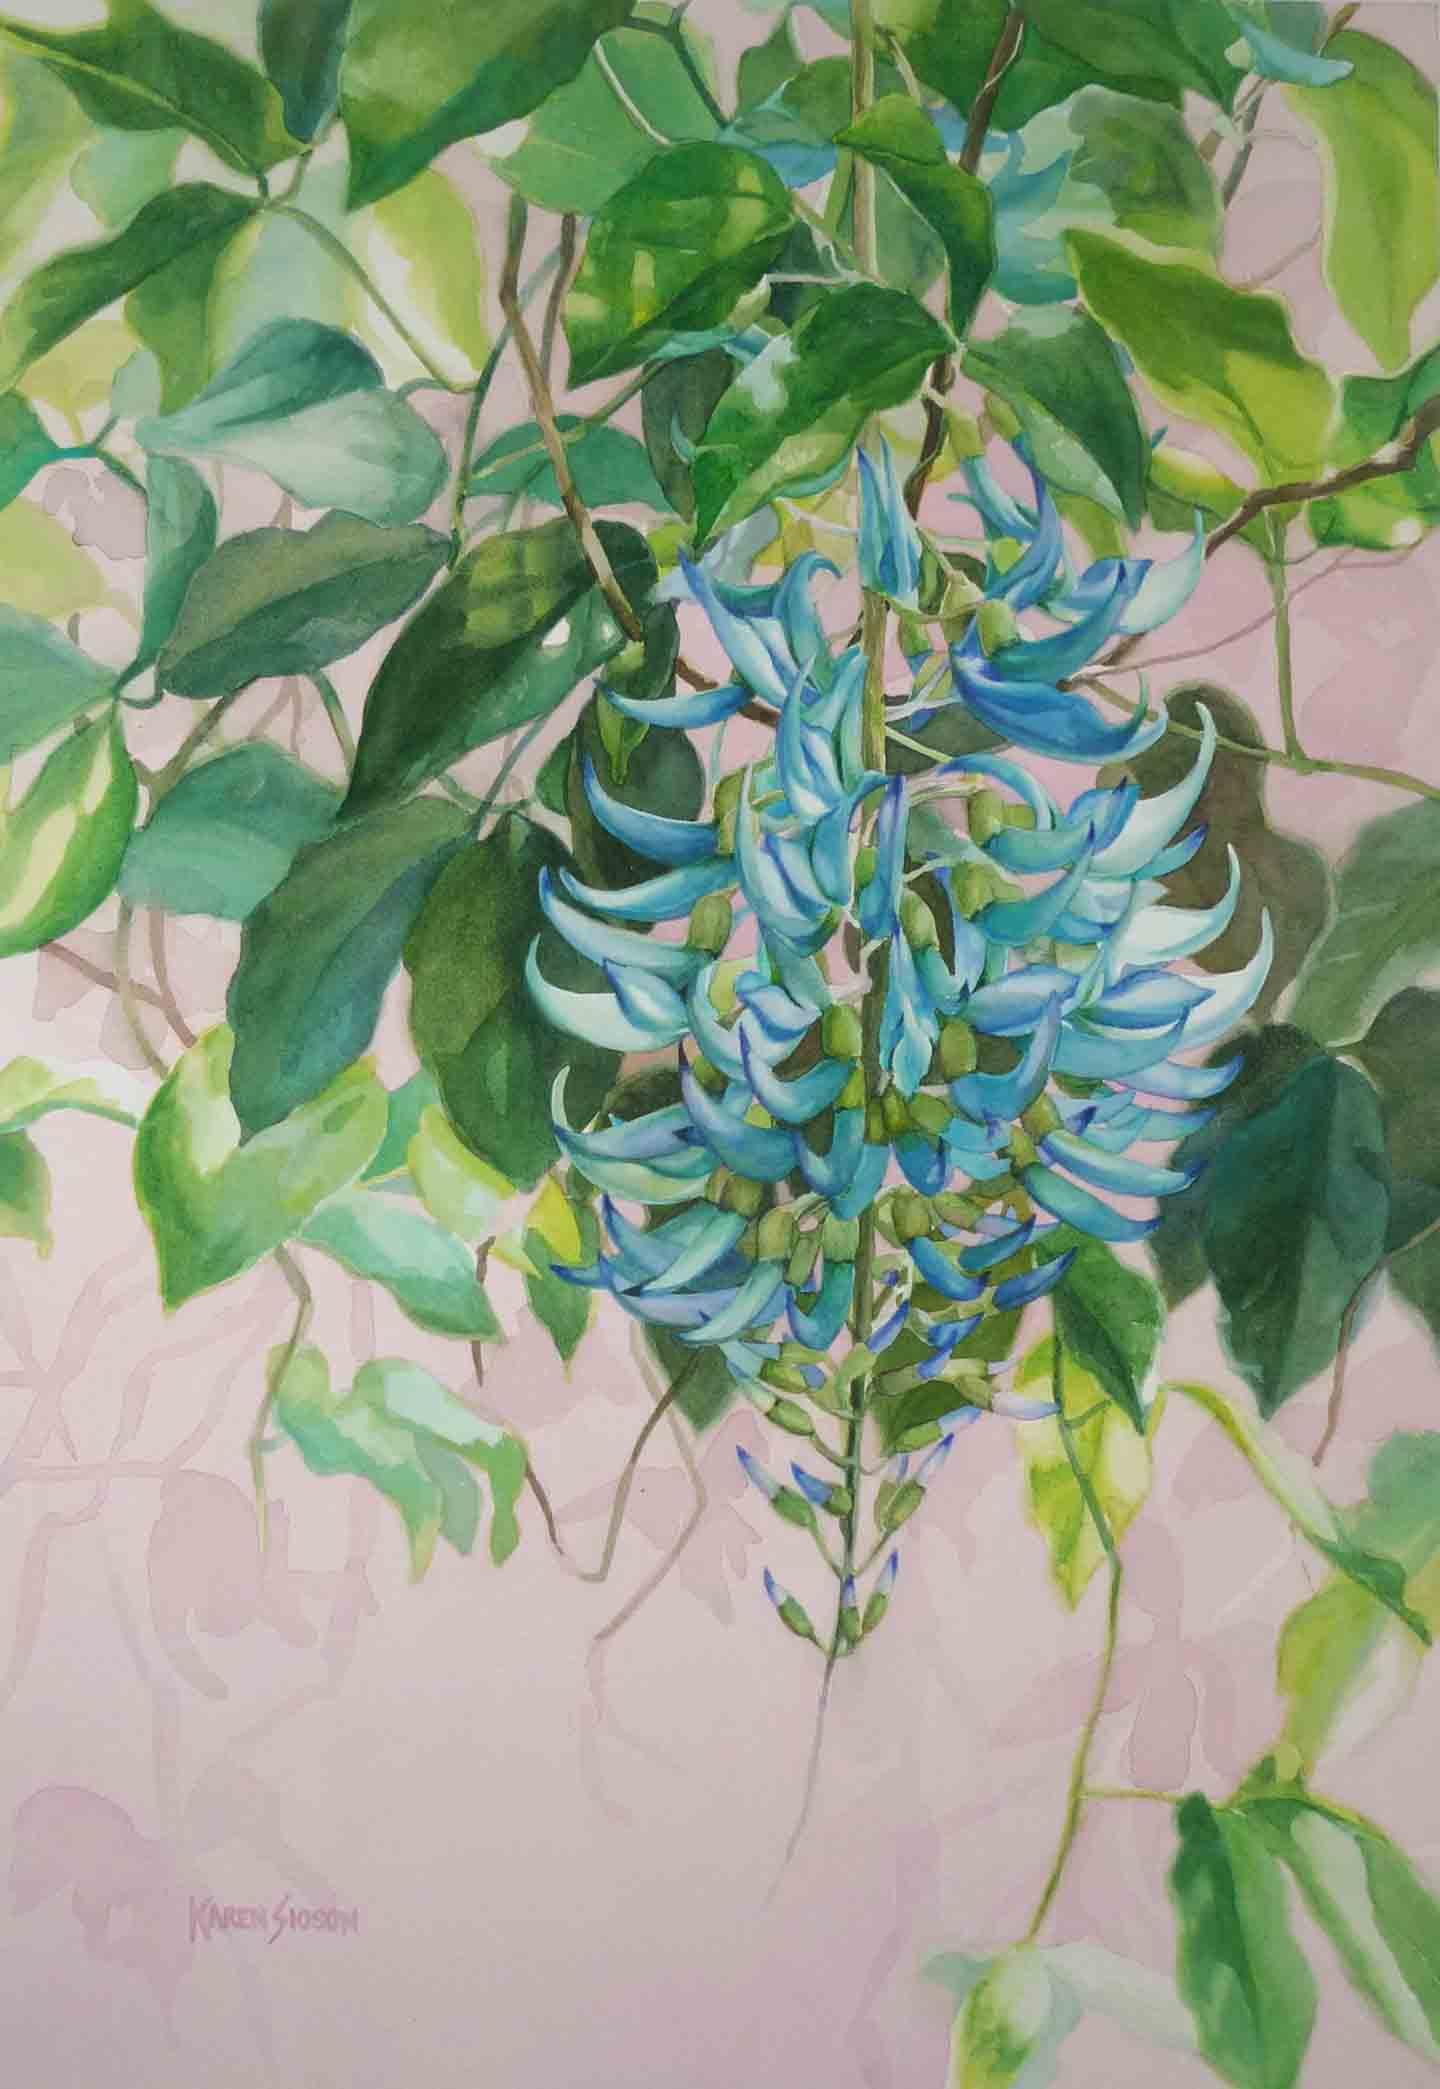 Jade Vine, 21.875 x 14.875 inches